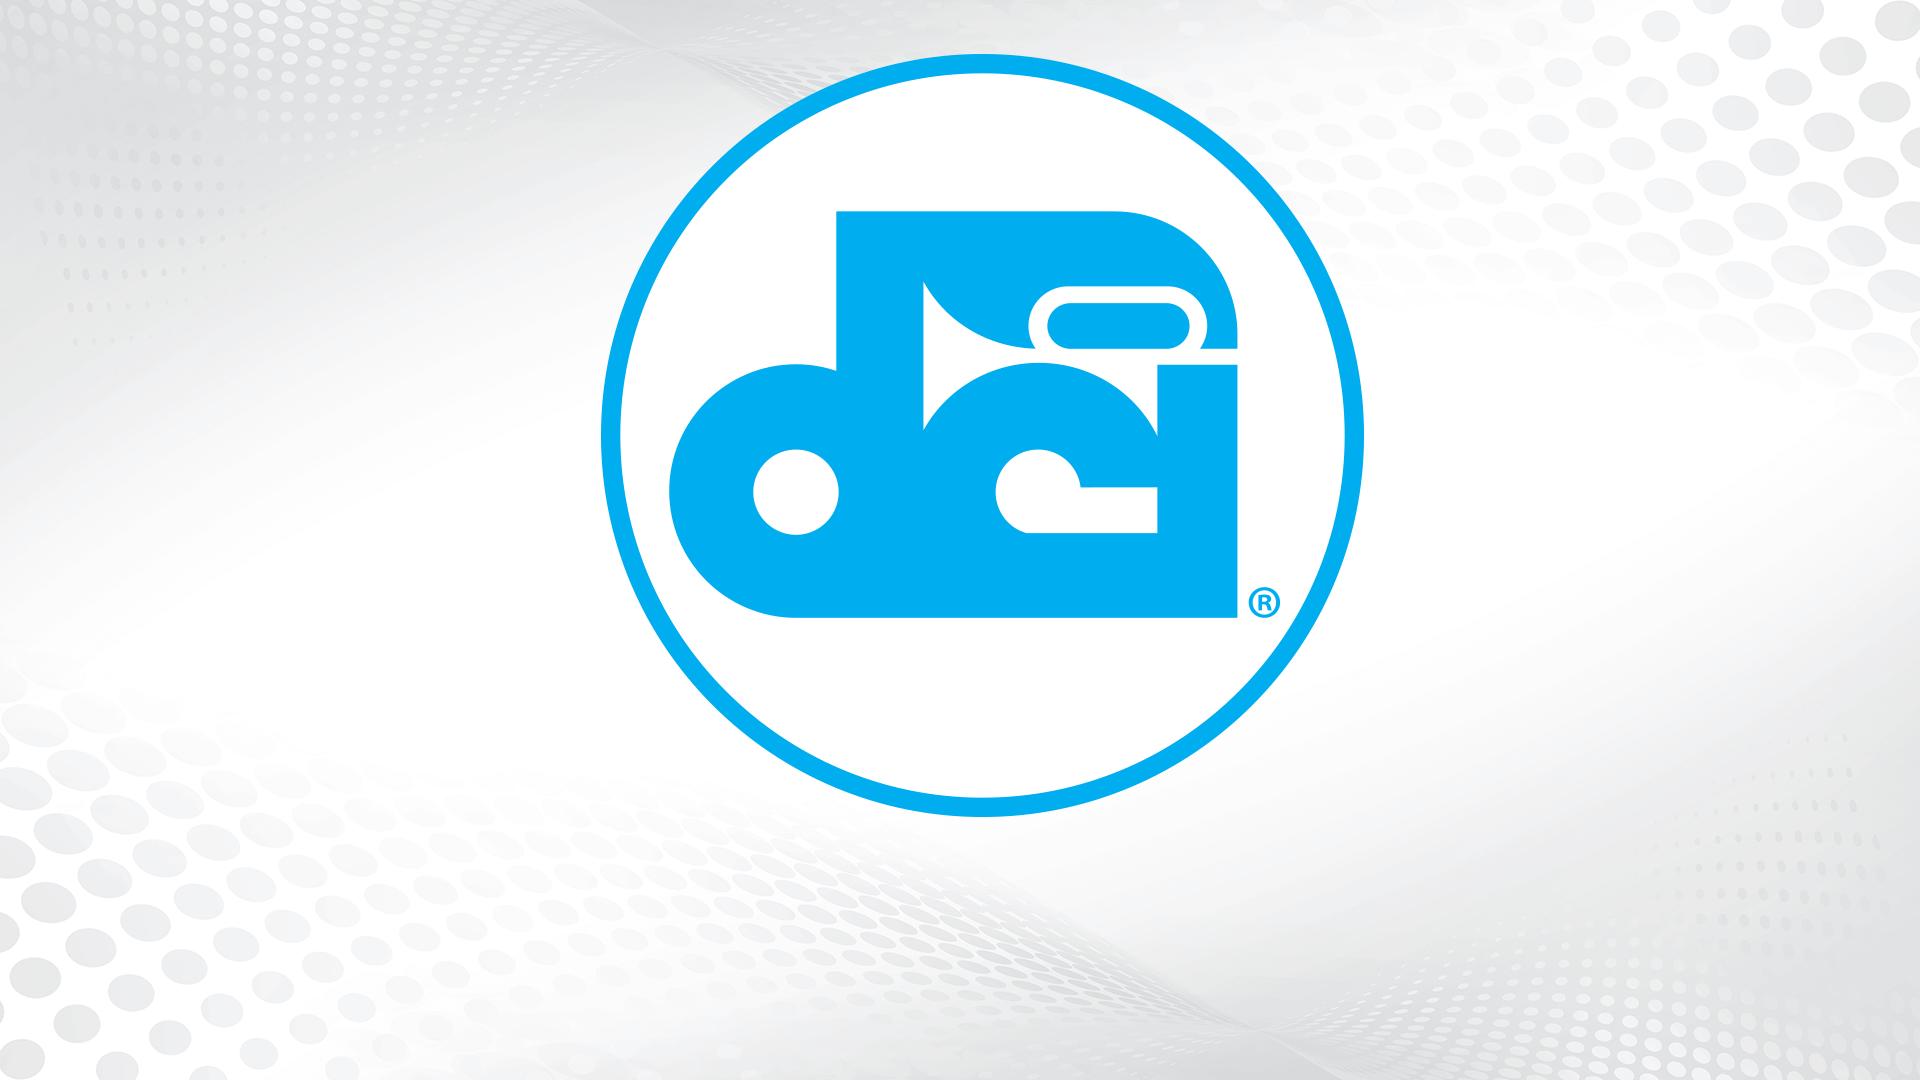 DCI statement regarding information disclosure